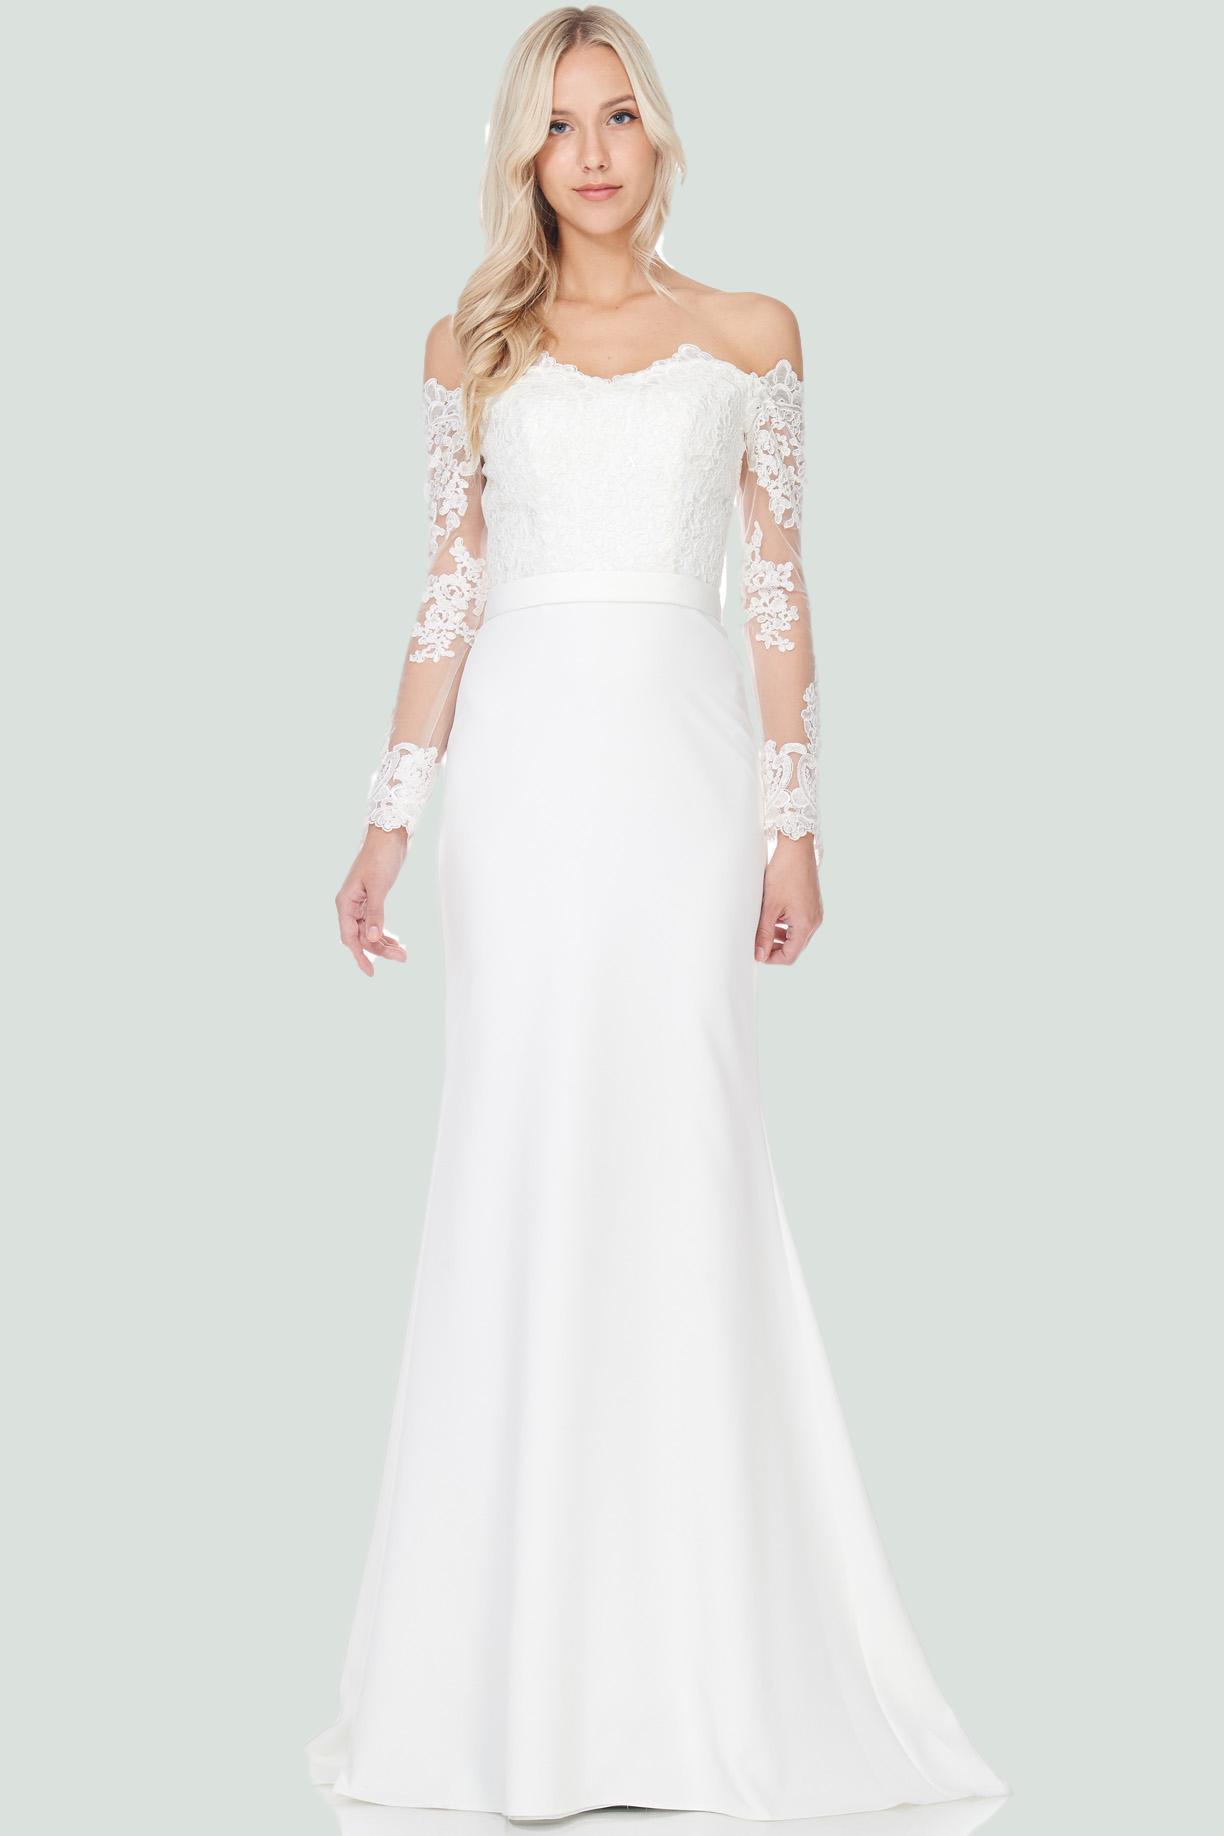 Elegant simple long sleeve lace wedding dress lace wedding dresses